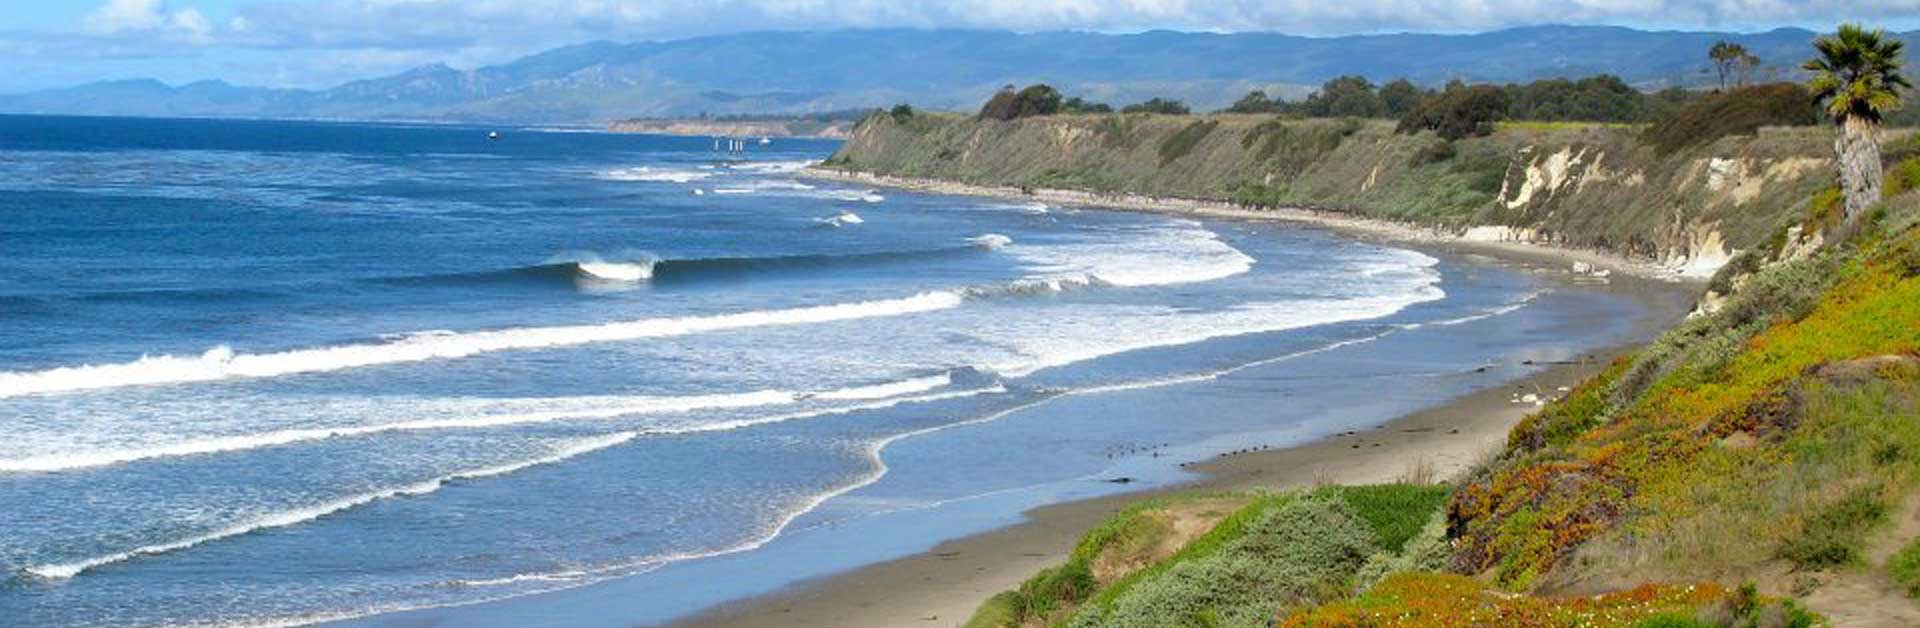 Santa Barbara coastline.